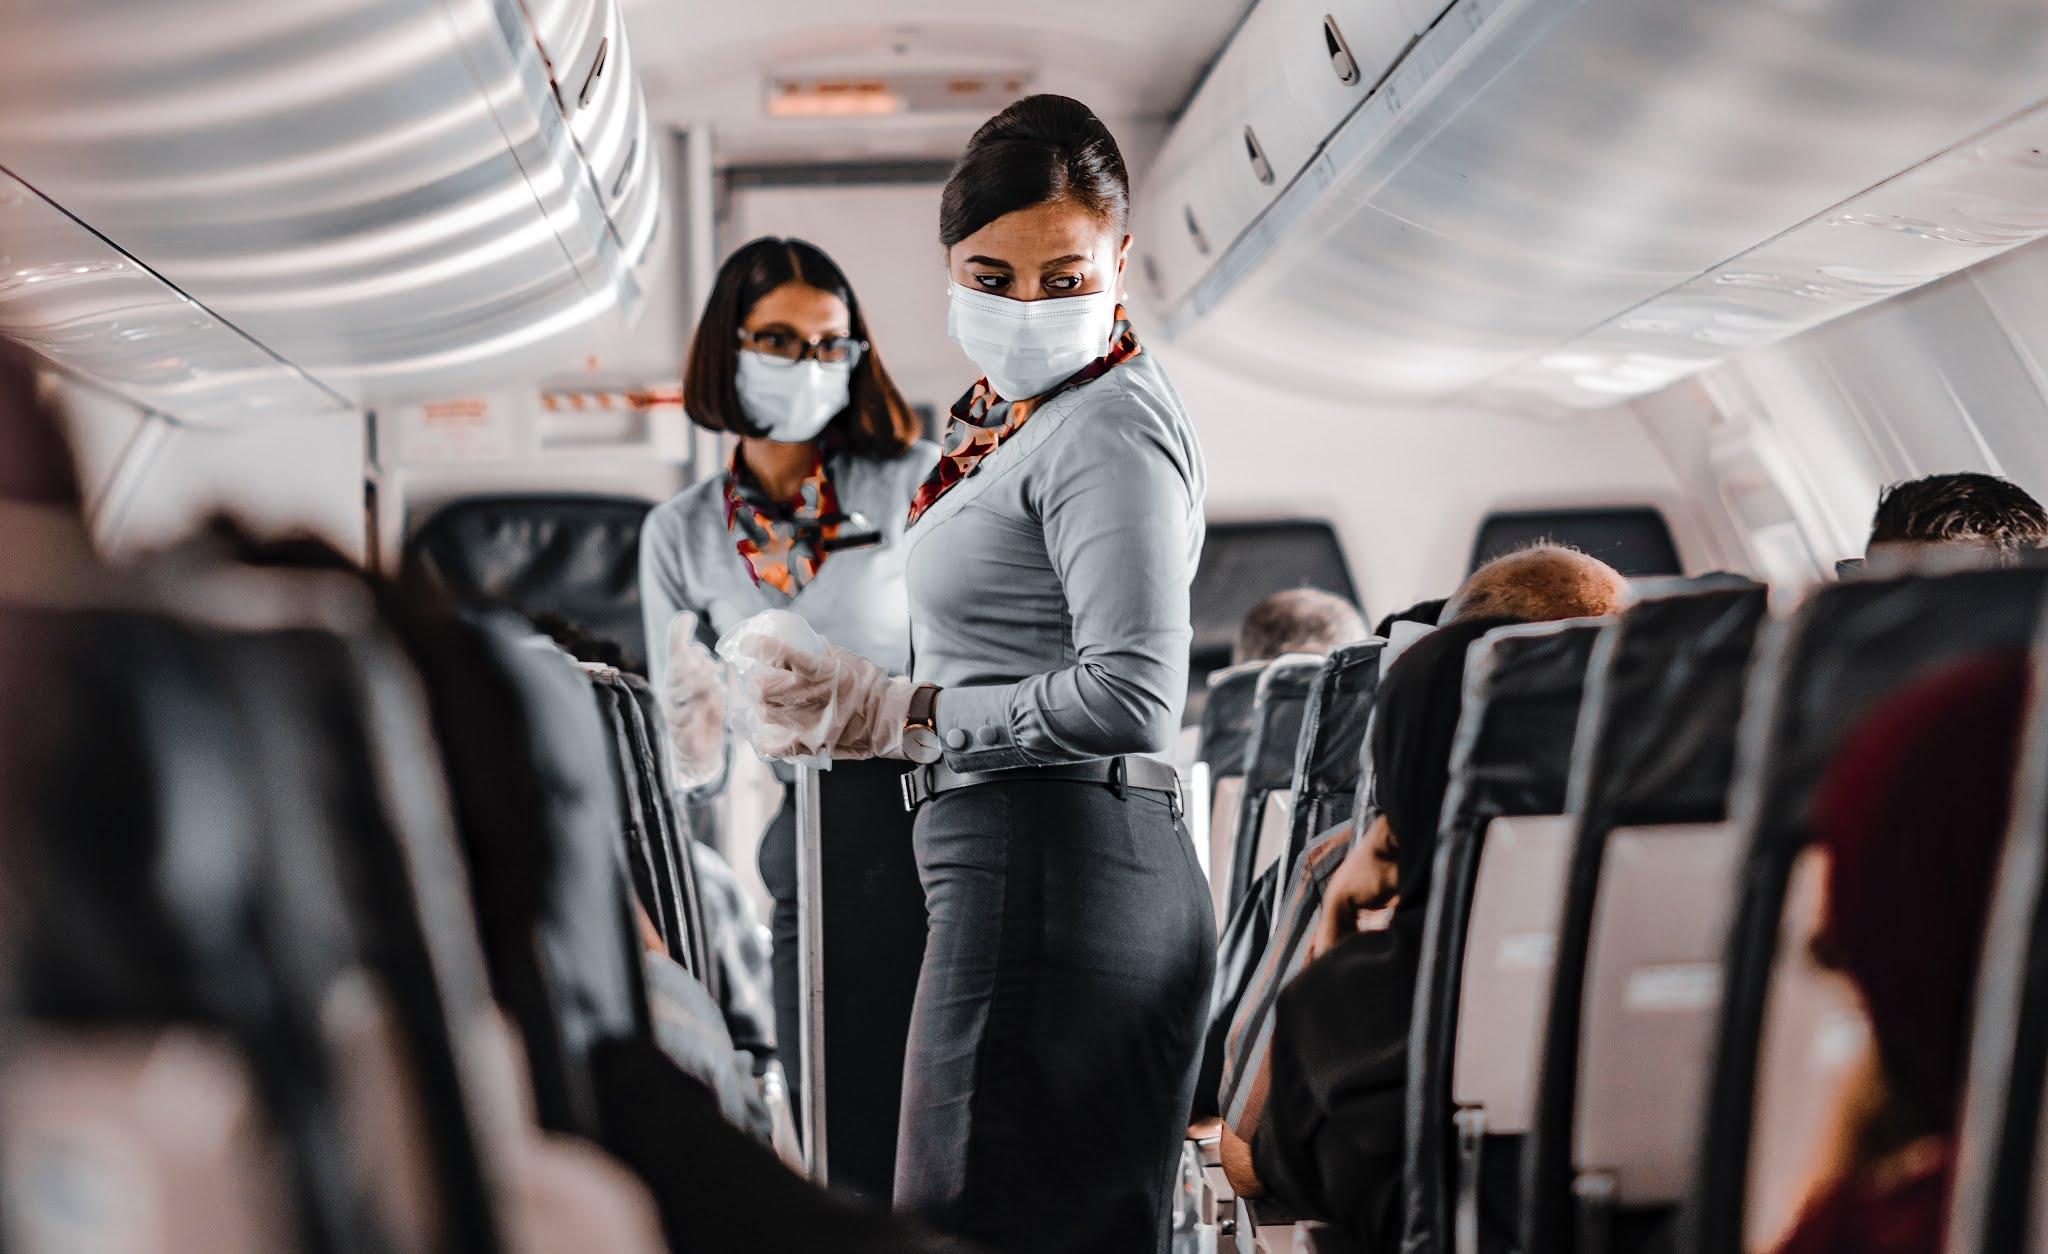 voos durante a pandemia